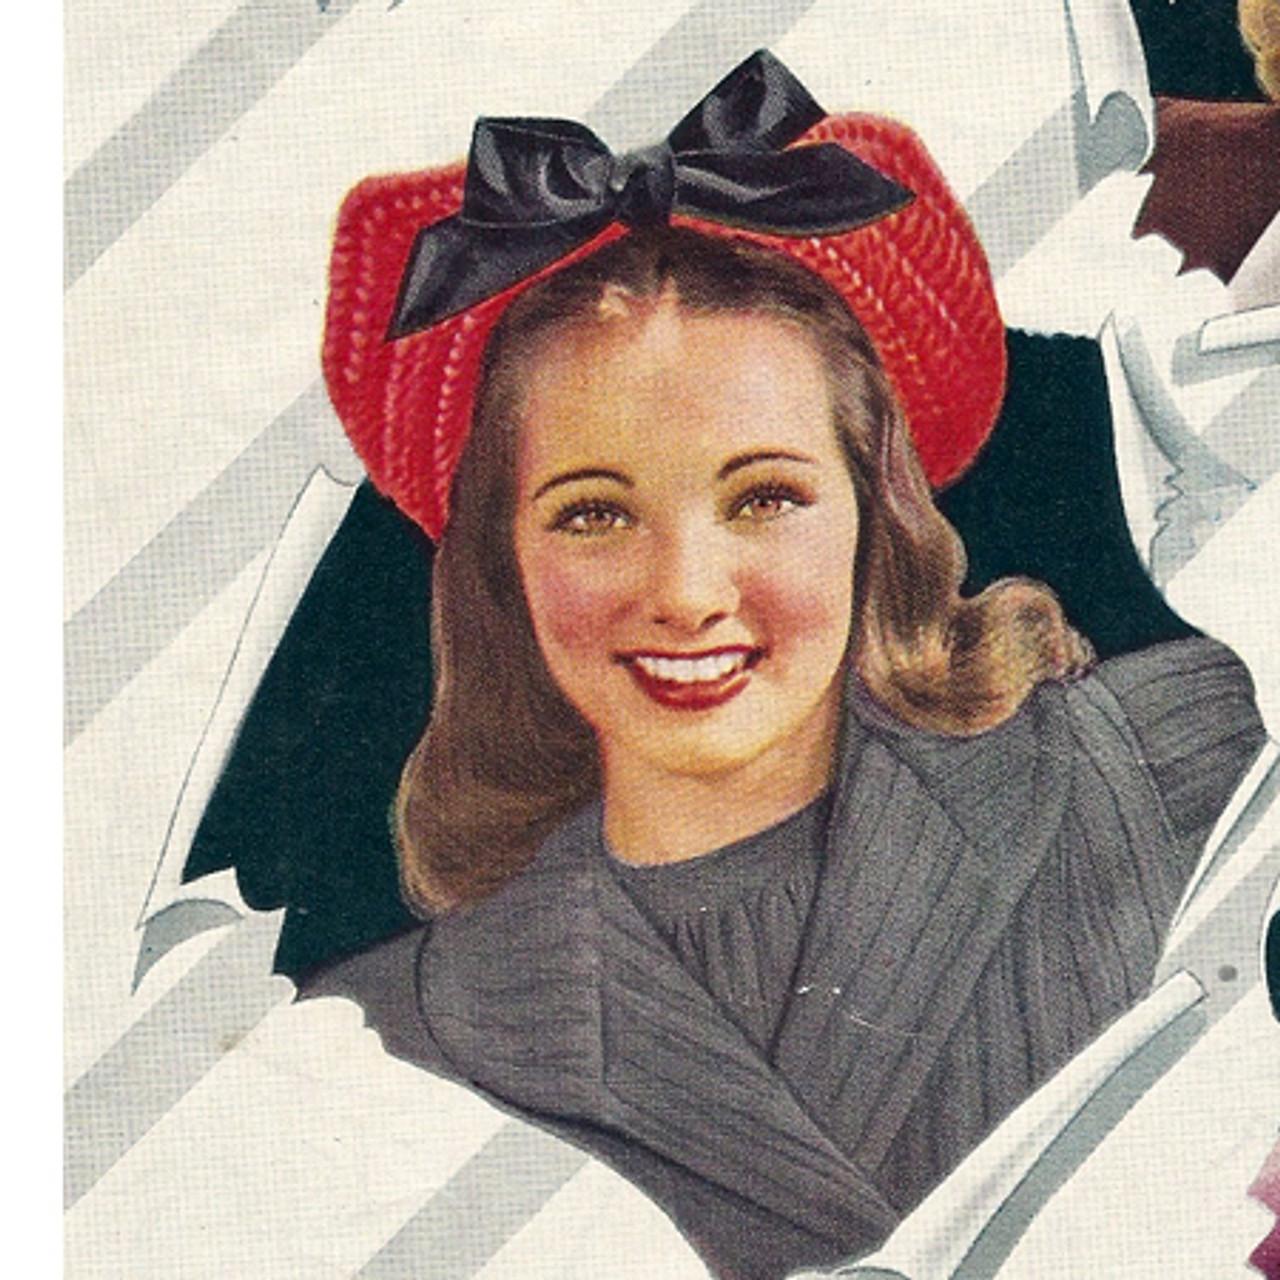 Crochet Square Brimmed Hat Pattern